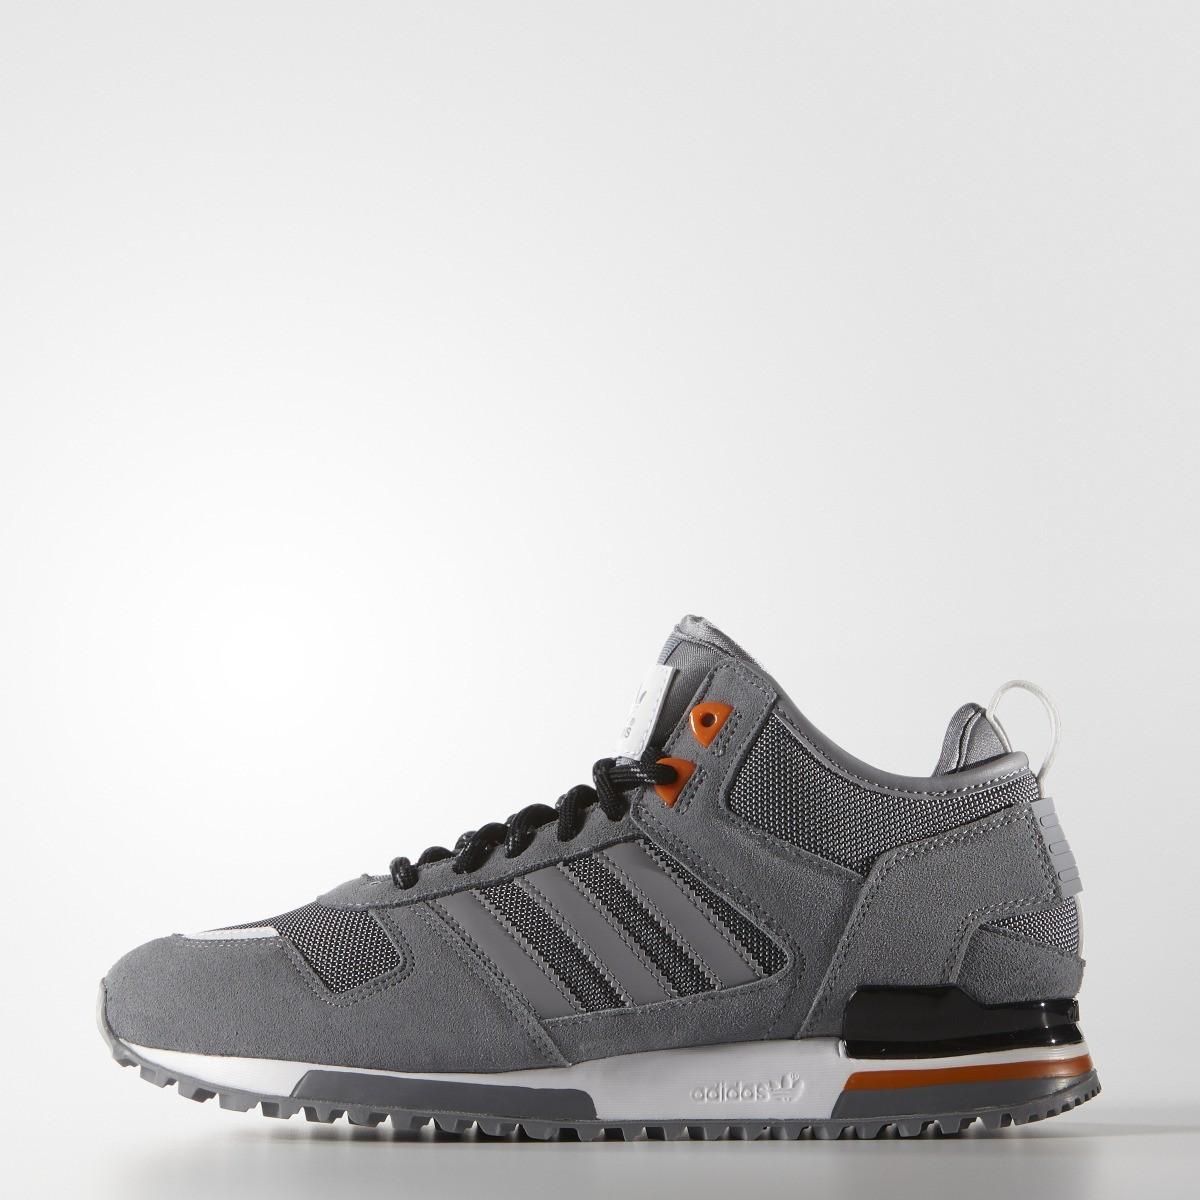 d598255ec69 Pánské zimní boty adidas ZX700 WINTER